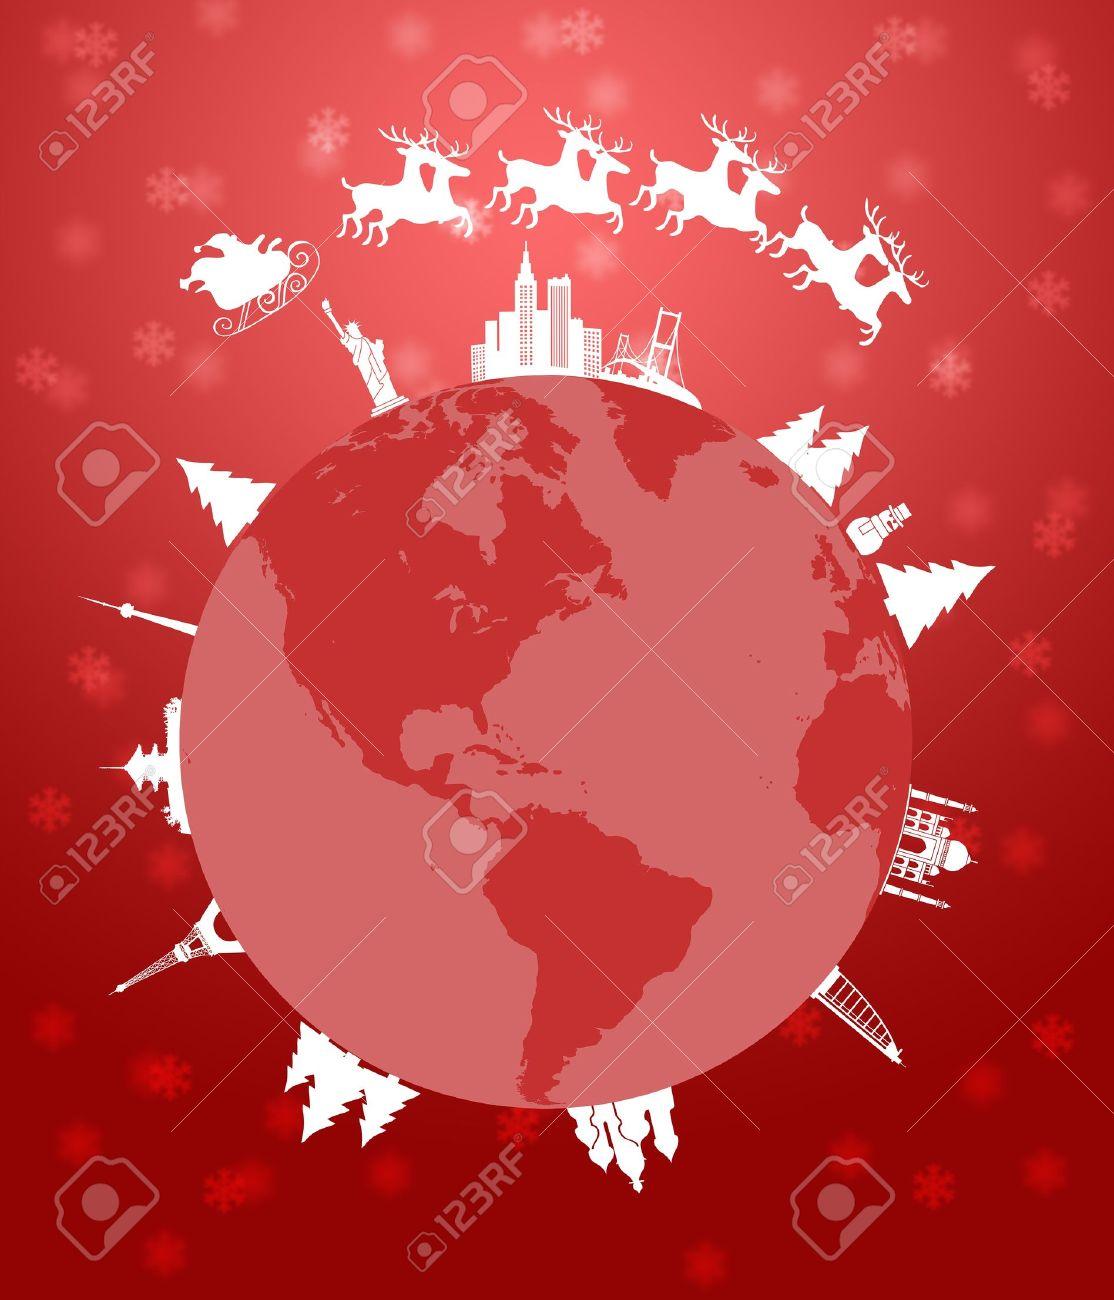 Santa Sleigh and Reindeer Flying Around the World Globe Red Background Illustration Stock Illustration - 11134083